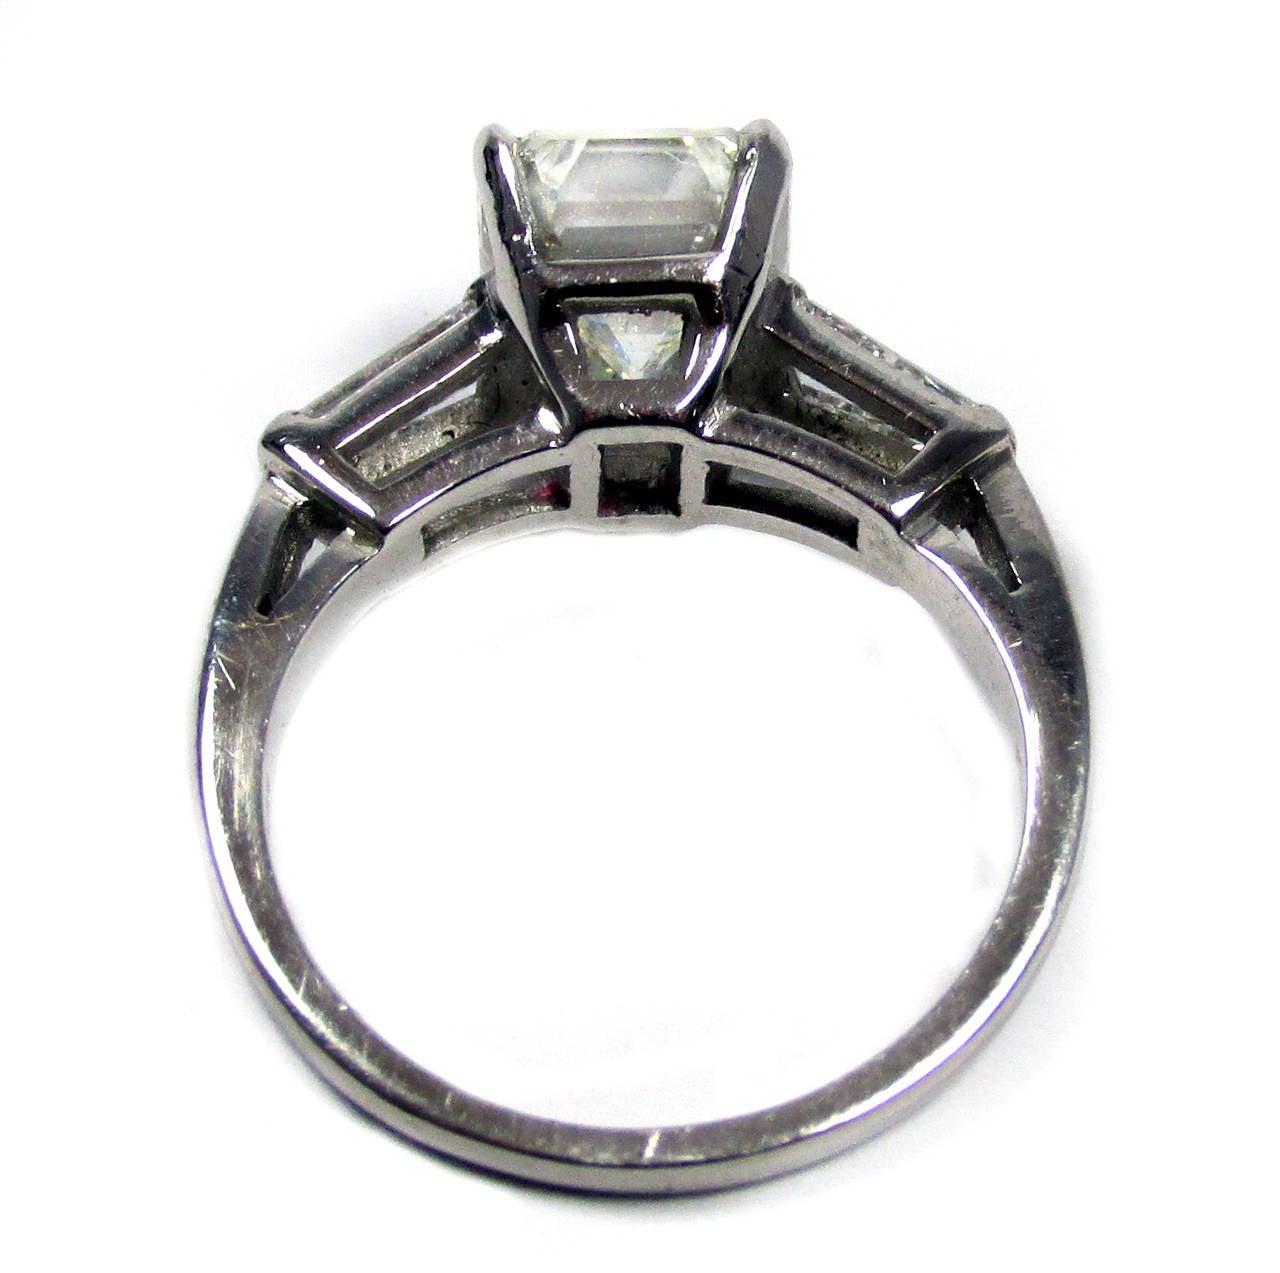 2 50 Carat Emerald Cut Diamond Platinum Ring at 1stdibs